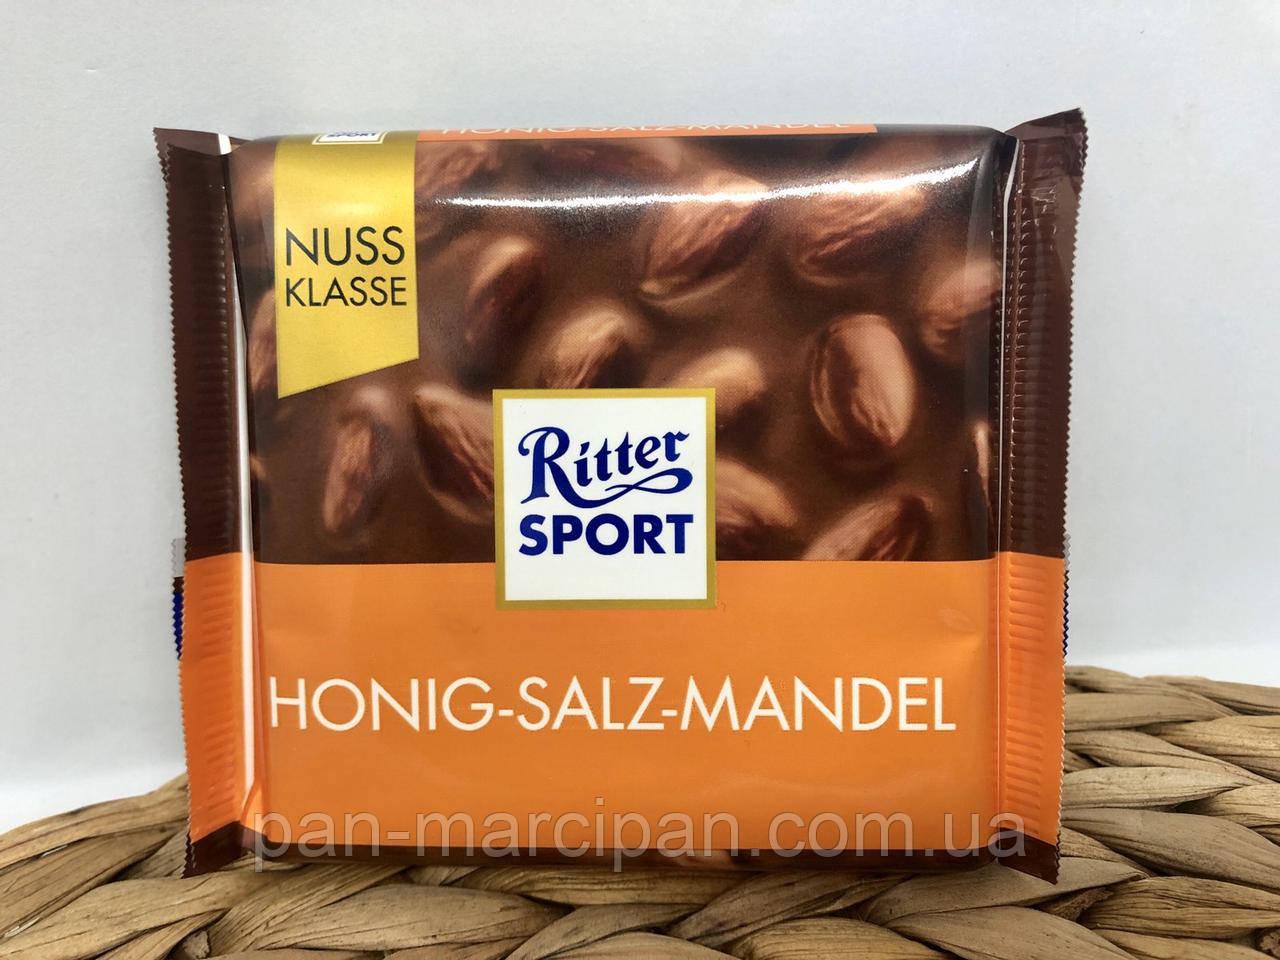 Шоколад Ritter Sport Honig Salz Mandel 100 г Німеччина